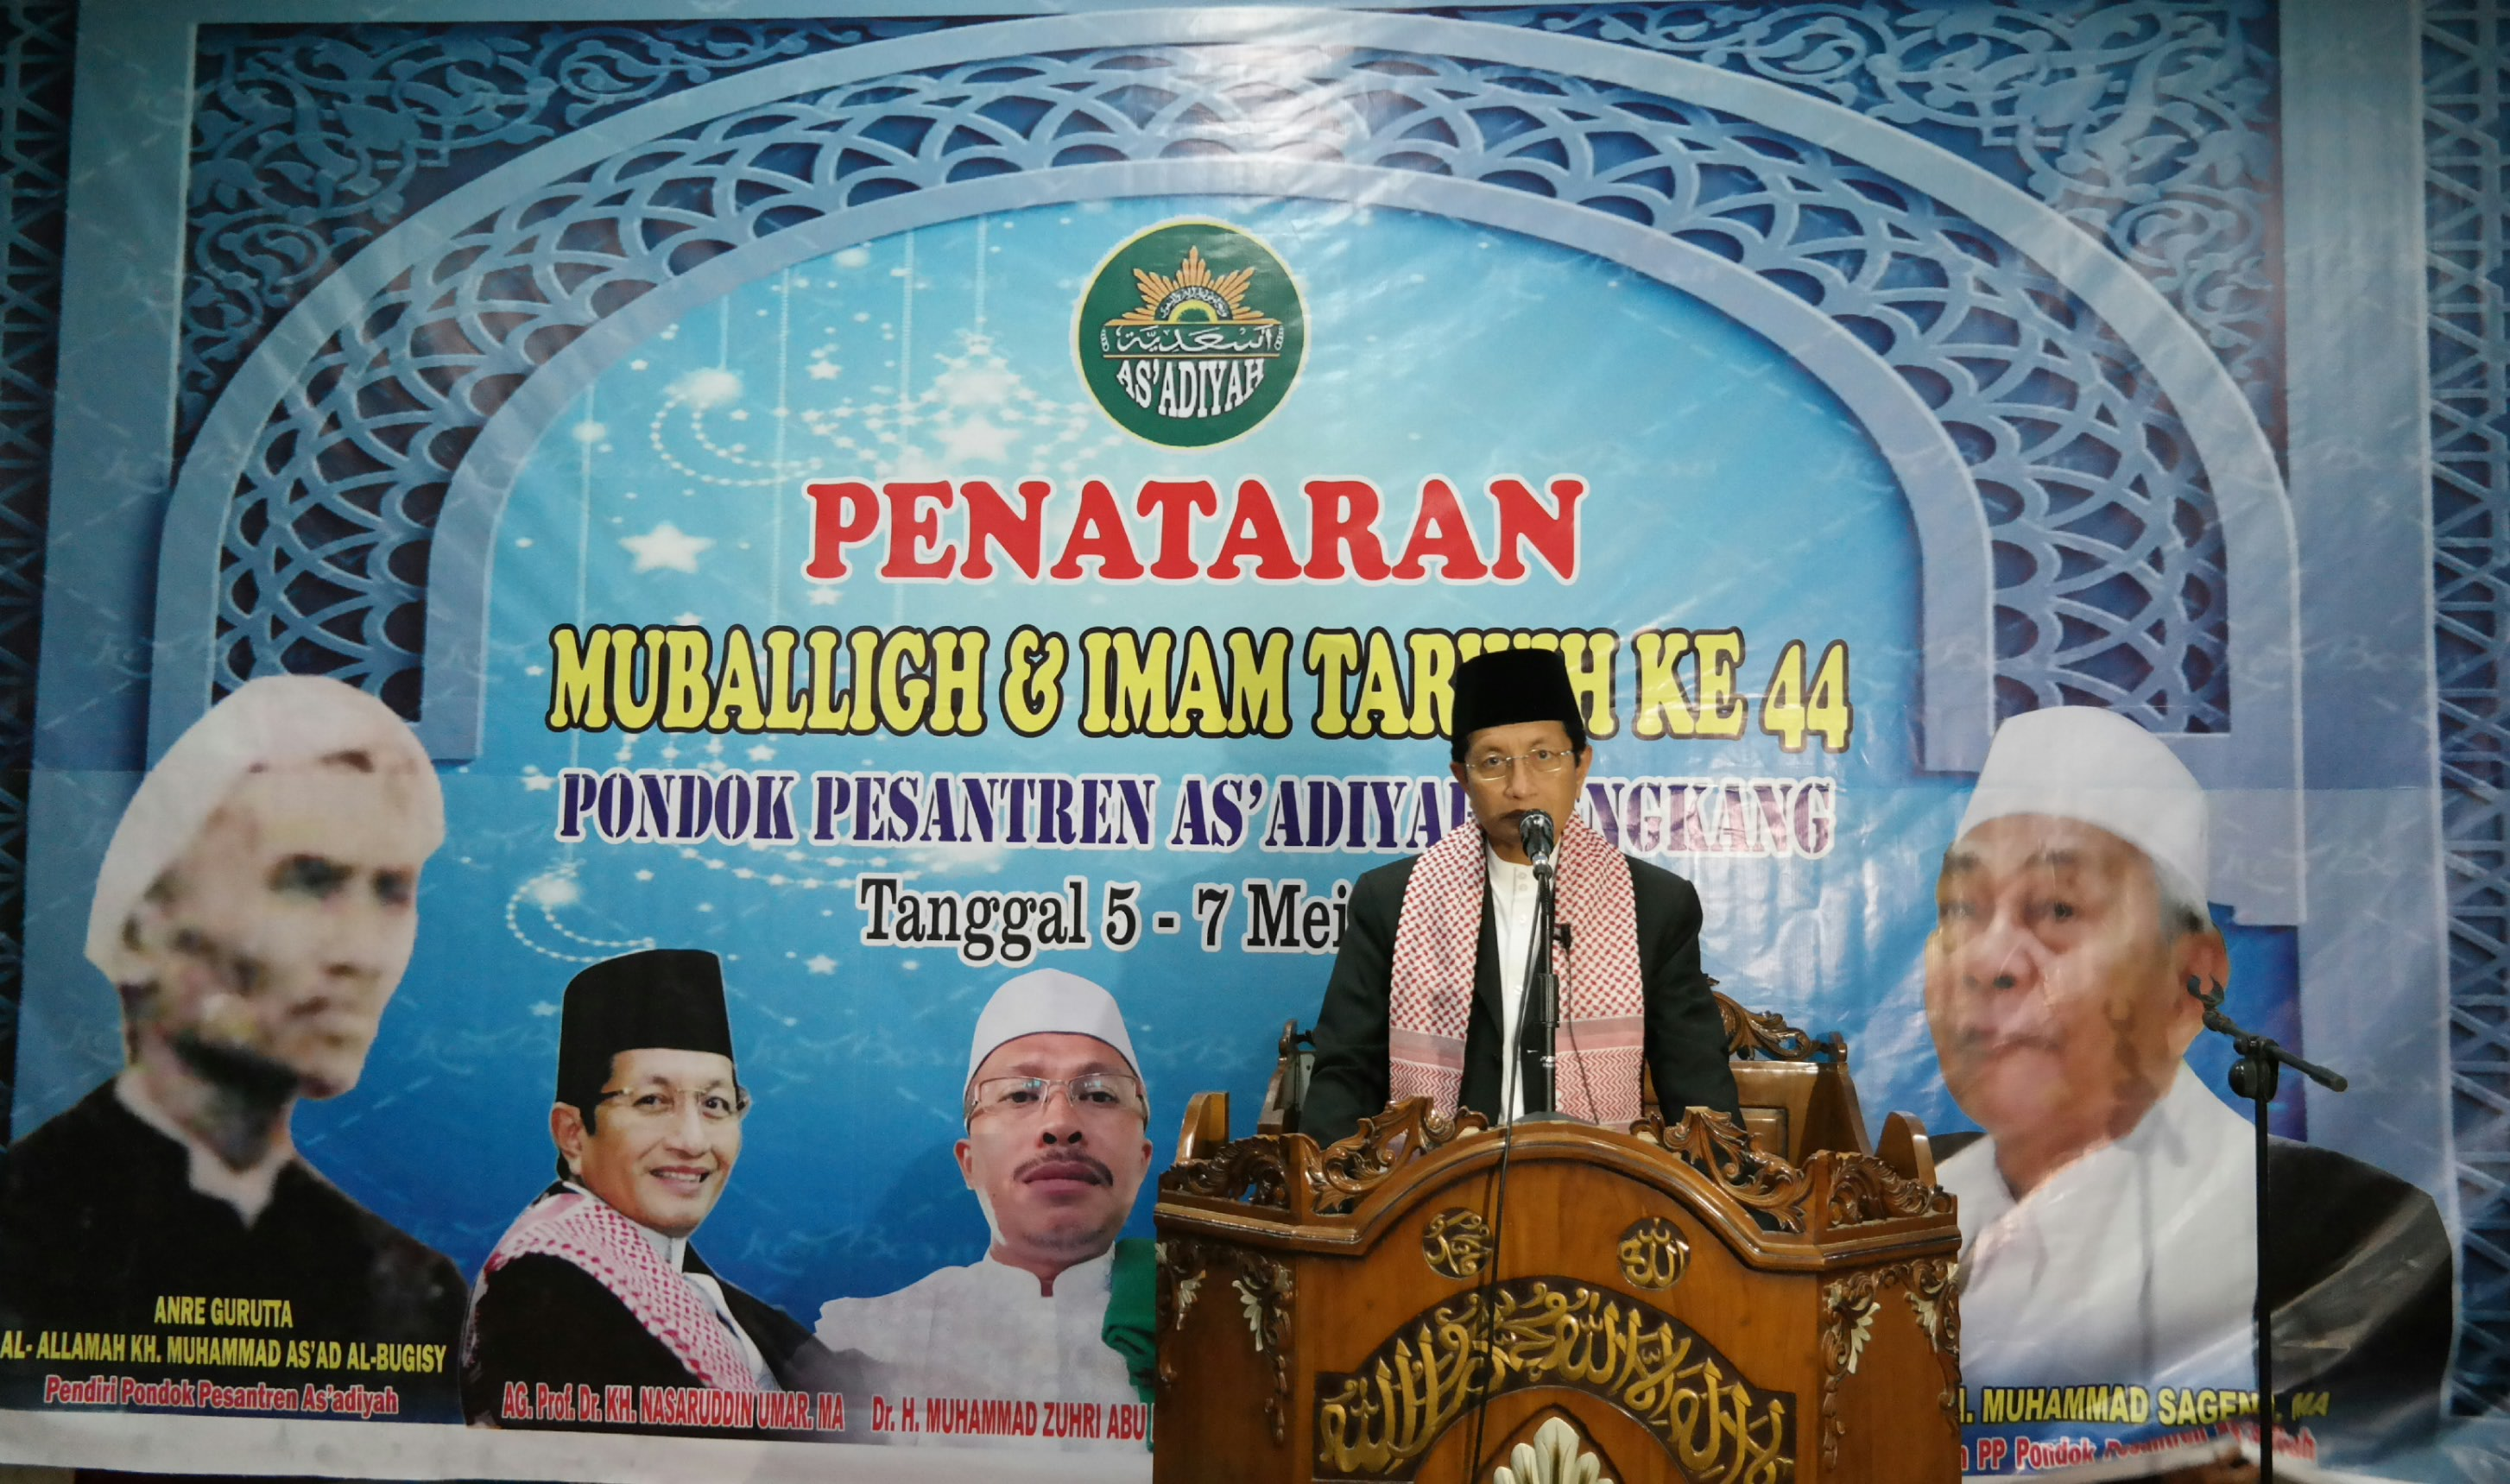 Wajengan Prof.Nasaruddin Umar Kepada Santri